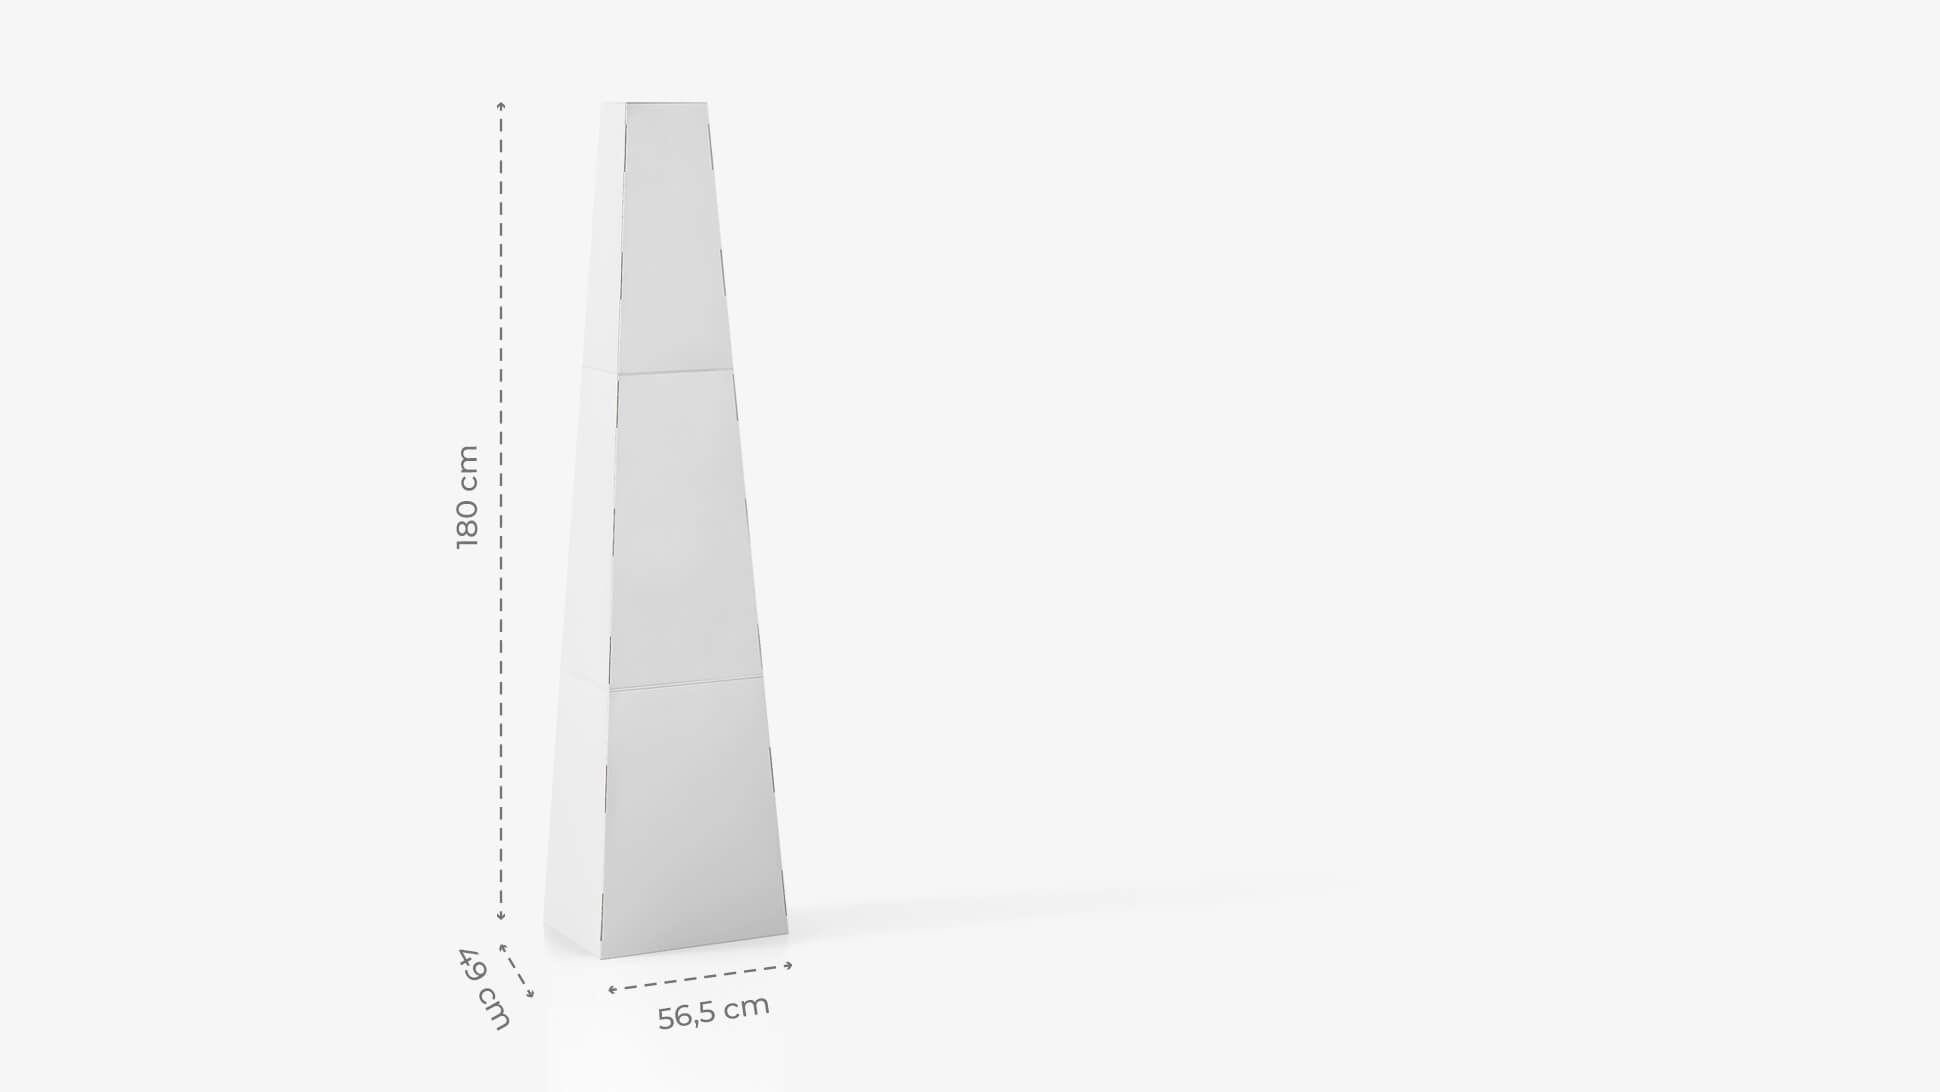 Display a piramide h180 cm personalizzabile | tictac.it